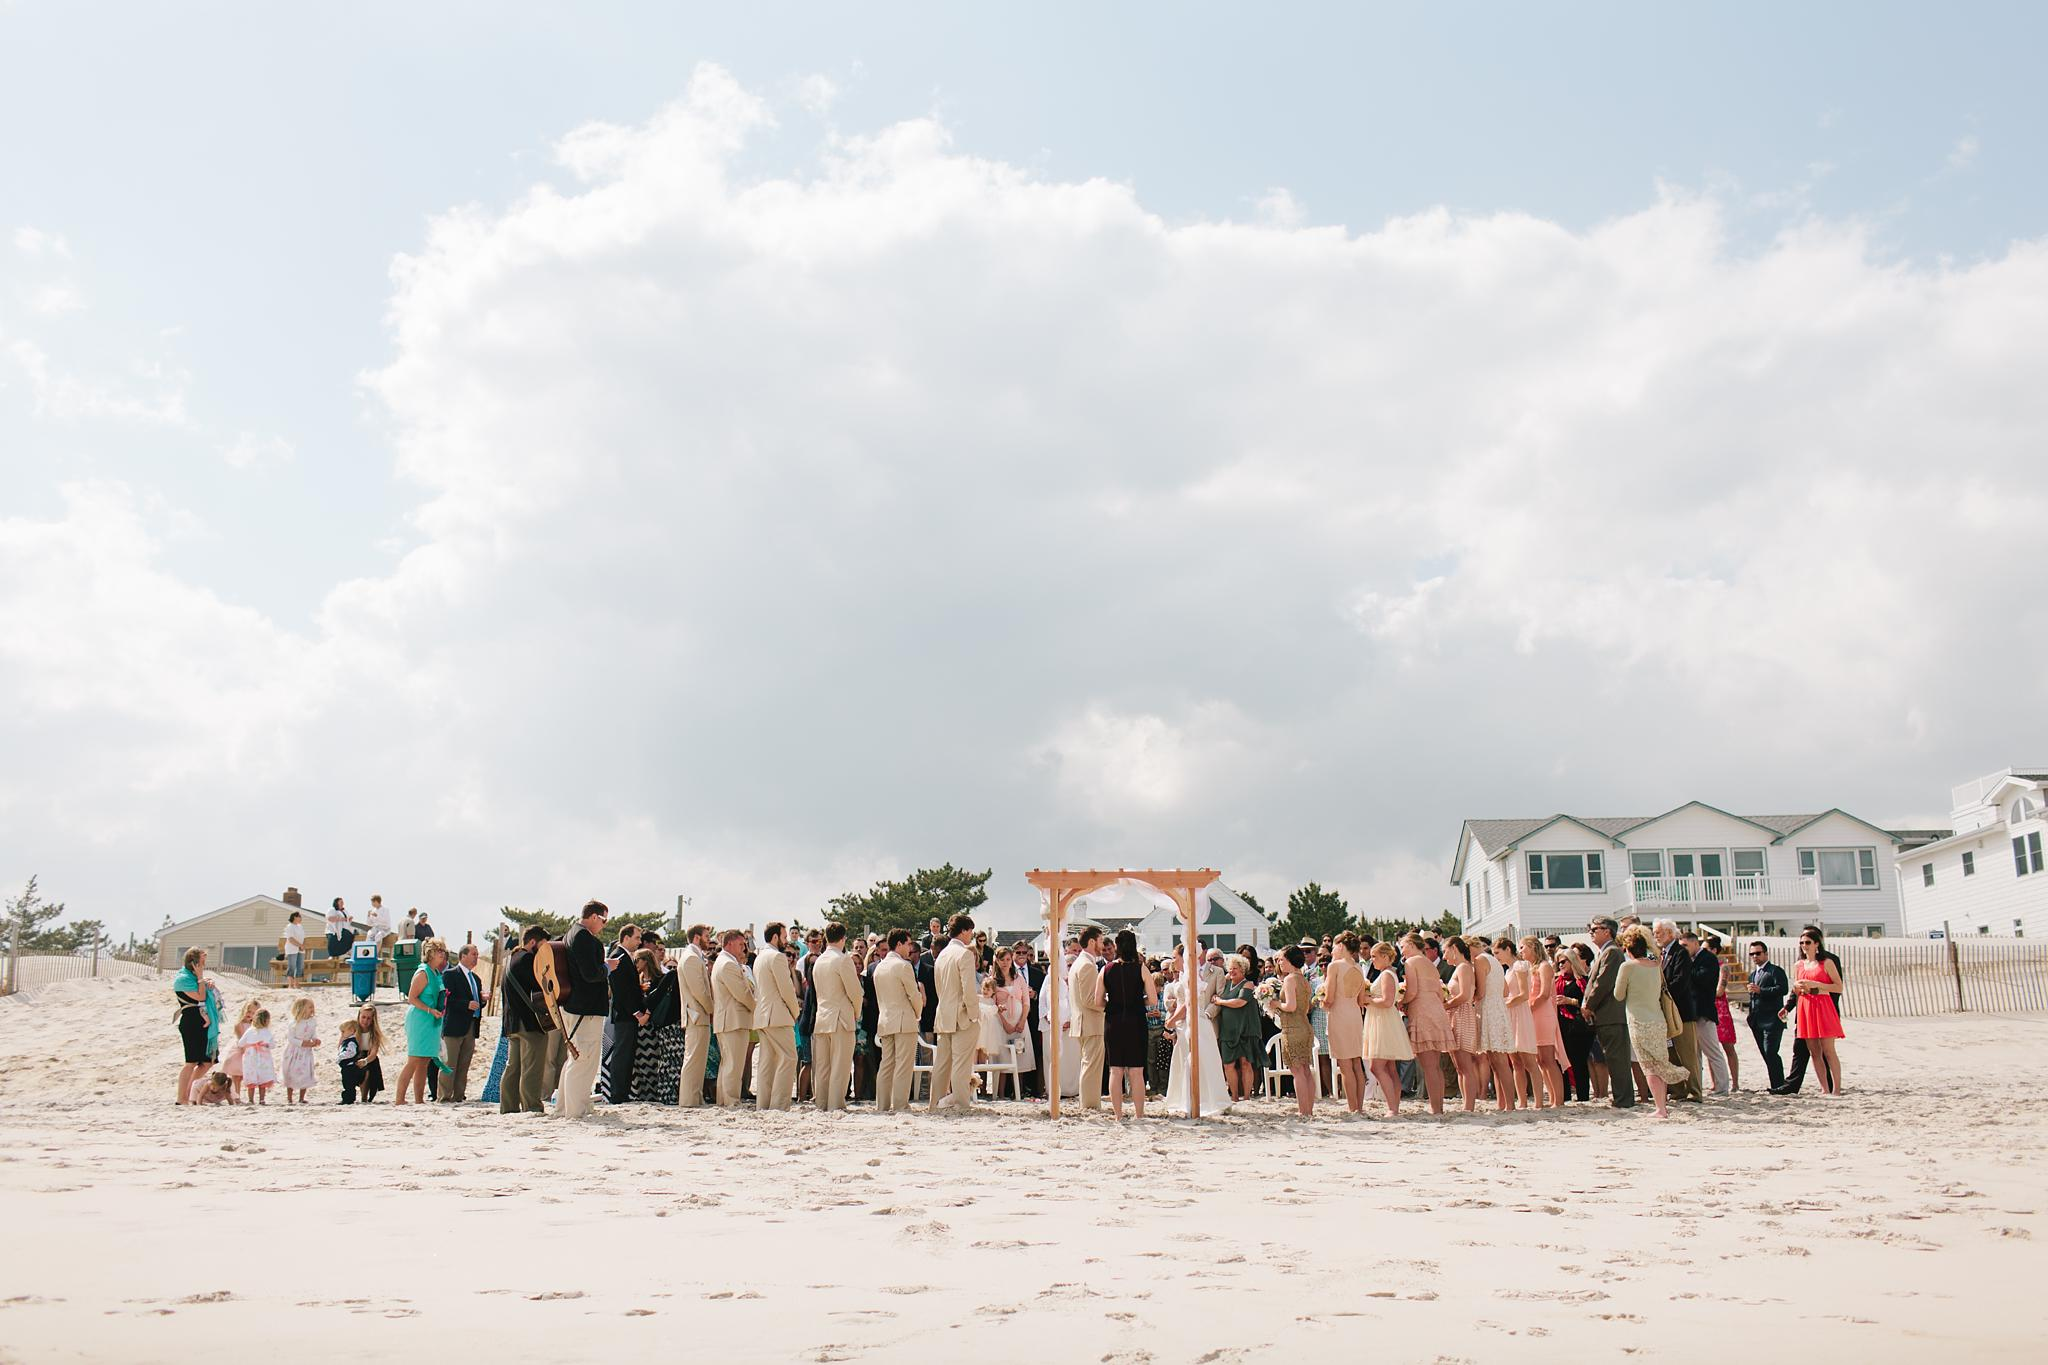 brant_beach_yacht_club_wedding_long_beach_island_nj_wedding_photographer_437.jpg